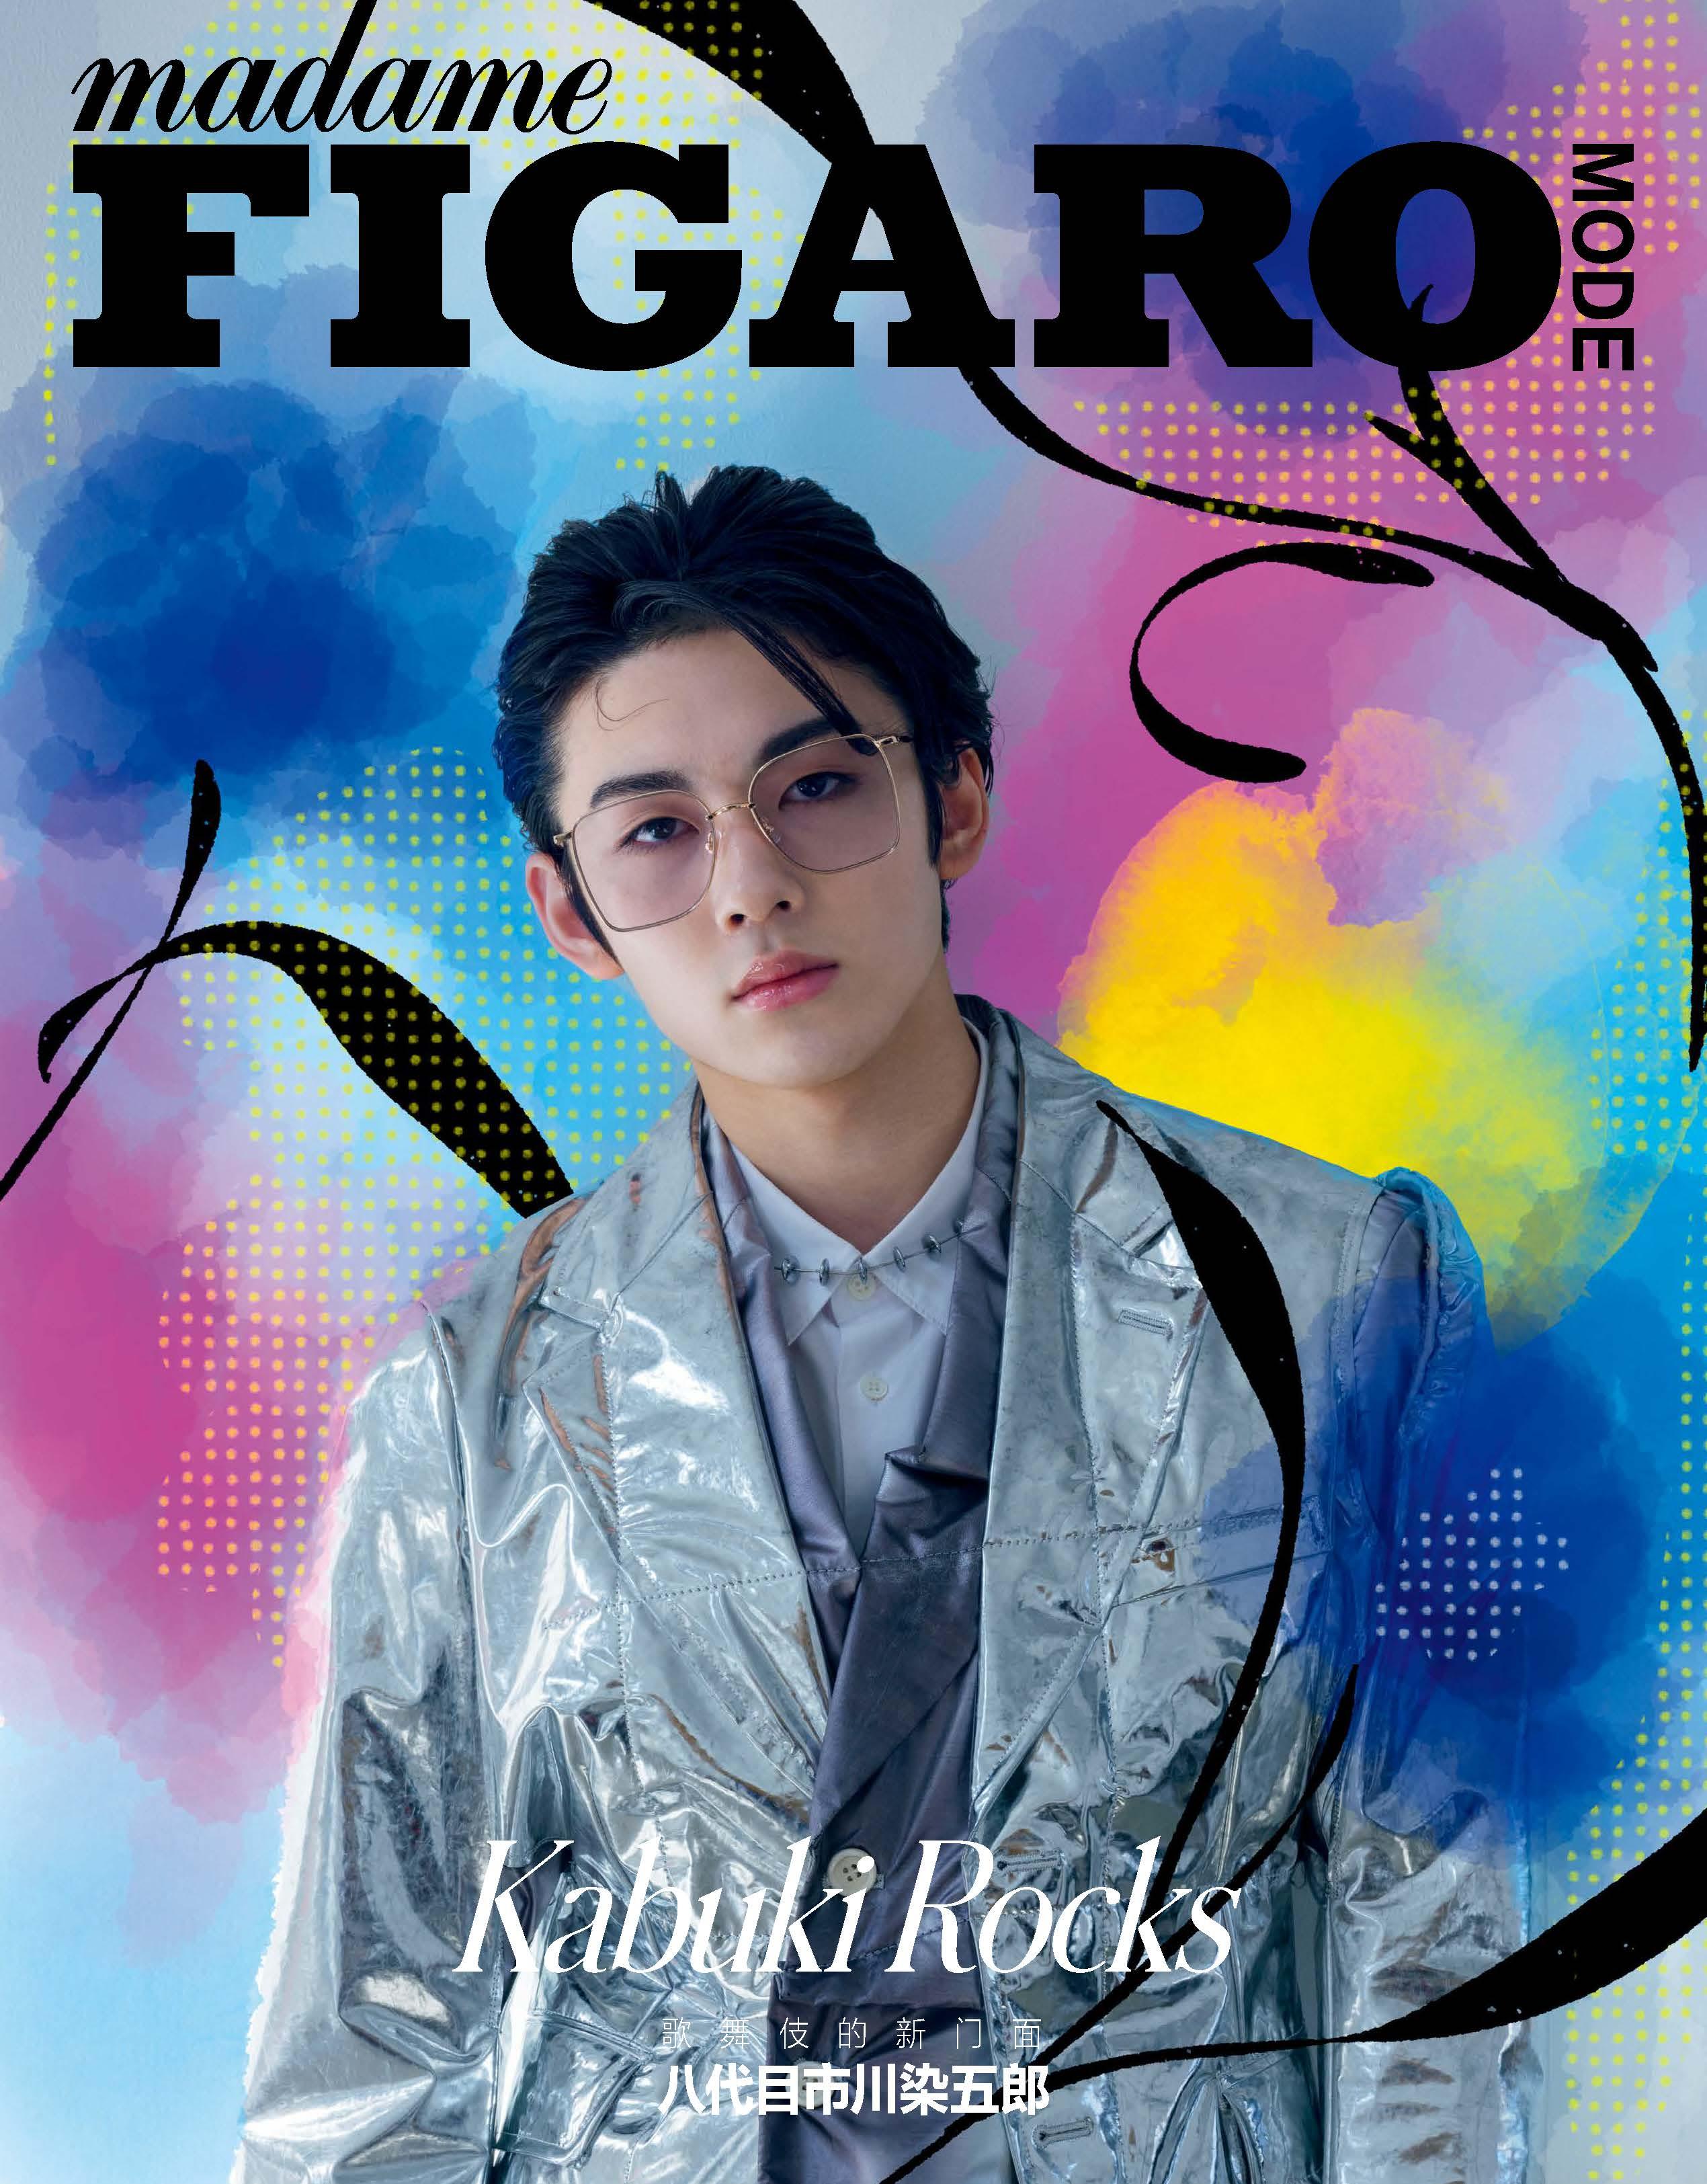 Madame Figaro MODE 3月号